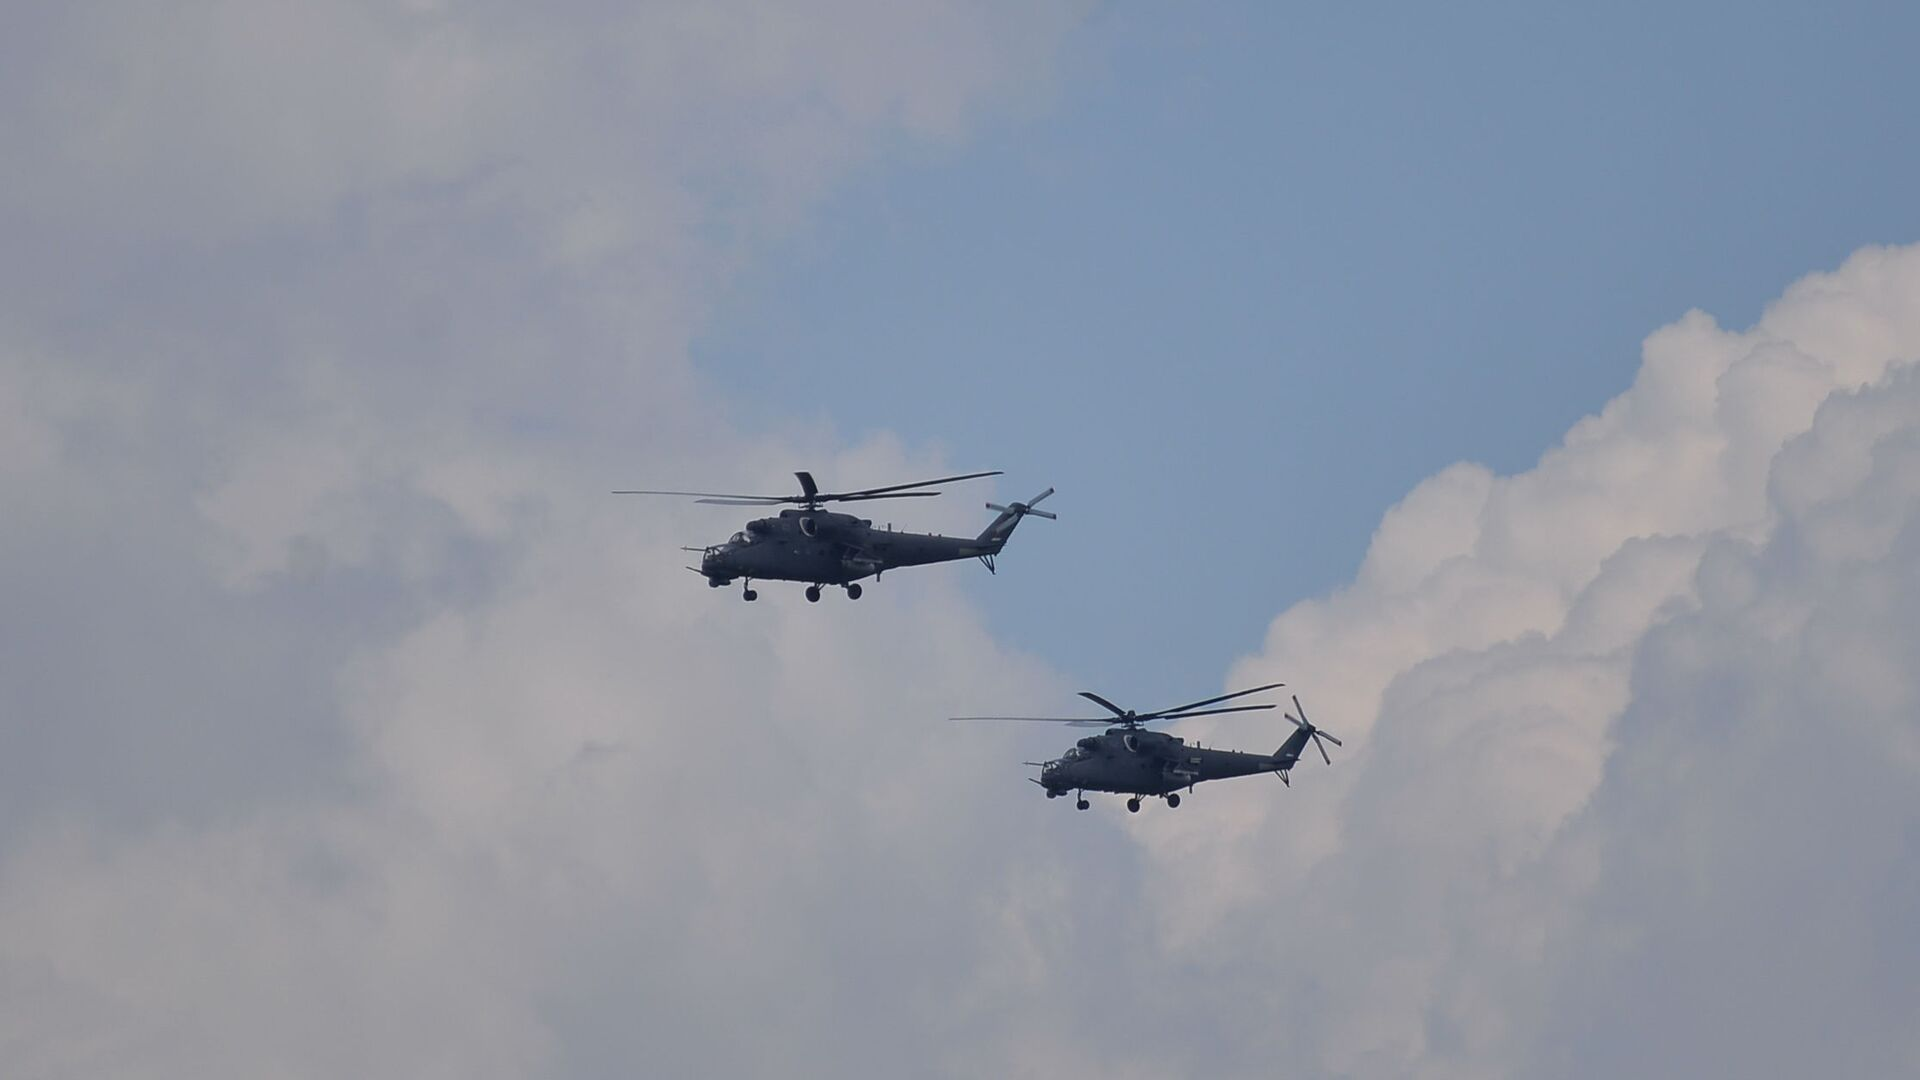 Nalet helikoptera Mi-35 - Sputnik Srbija, 1920, 24.09.2021